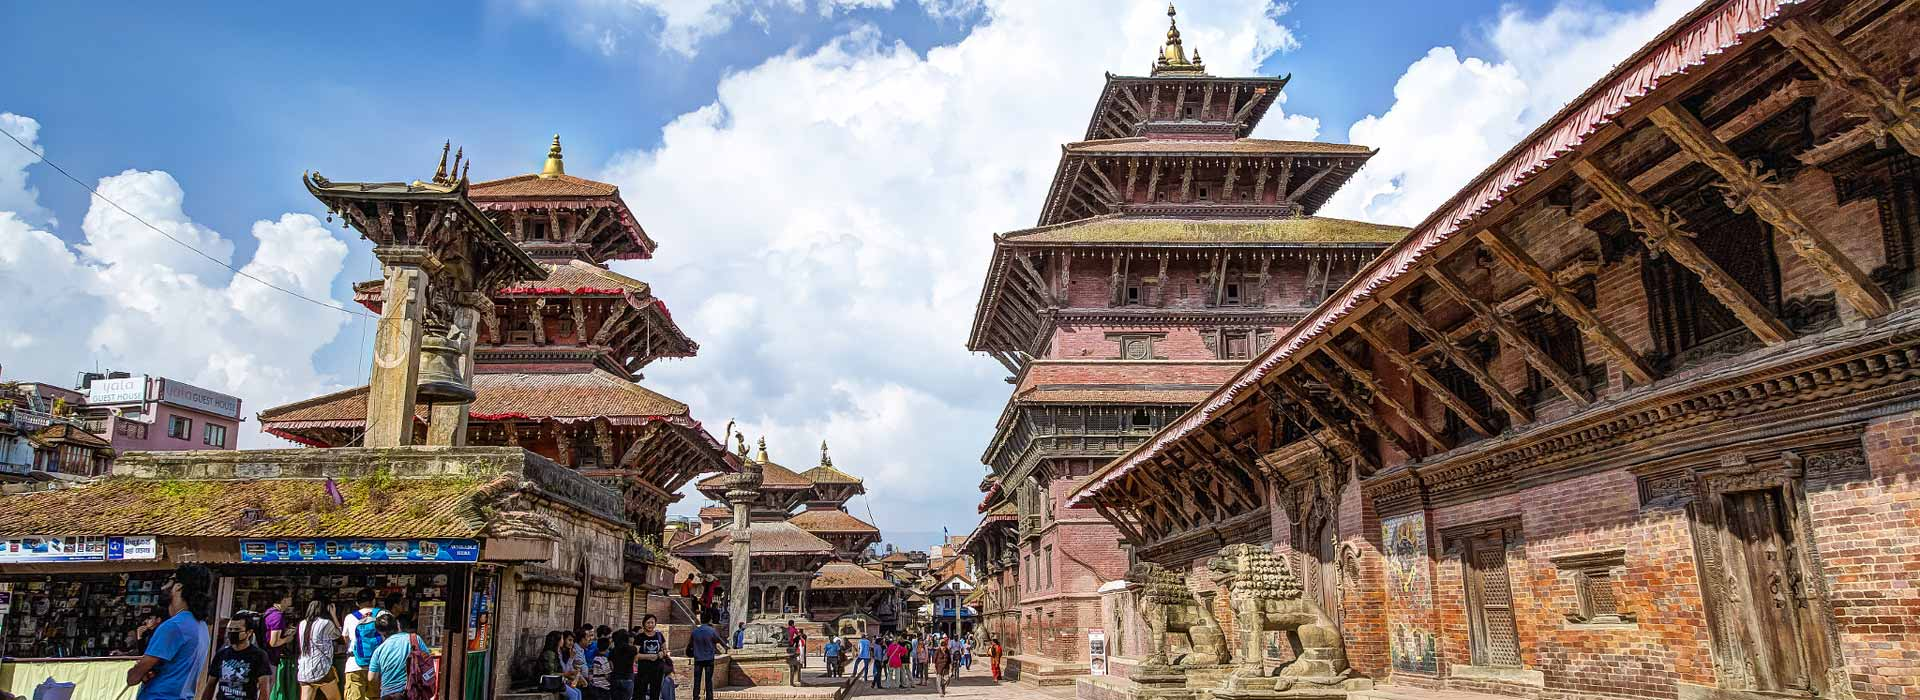 Kathmandu Valley Heritage Tour - Patan Durbar Square